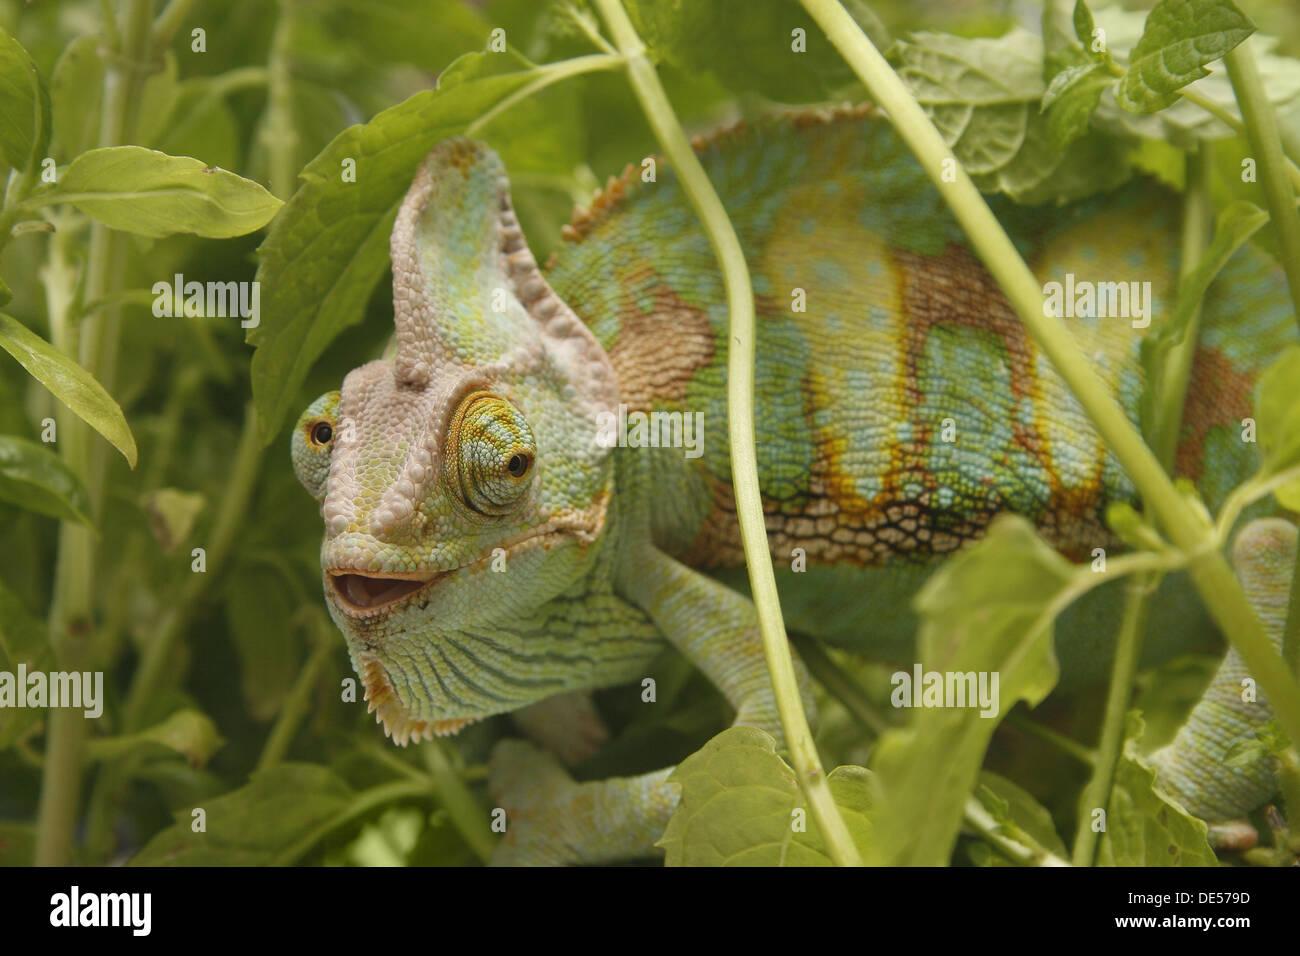 male yemen or veiled chameleon amongst plants Chamaeleo calyptratus - Stock Image